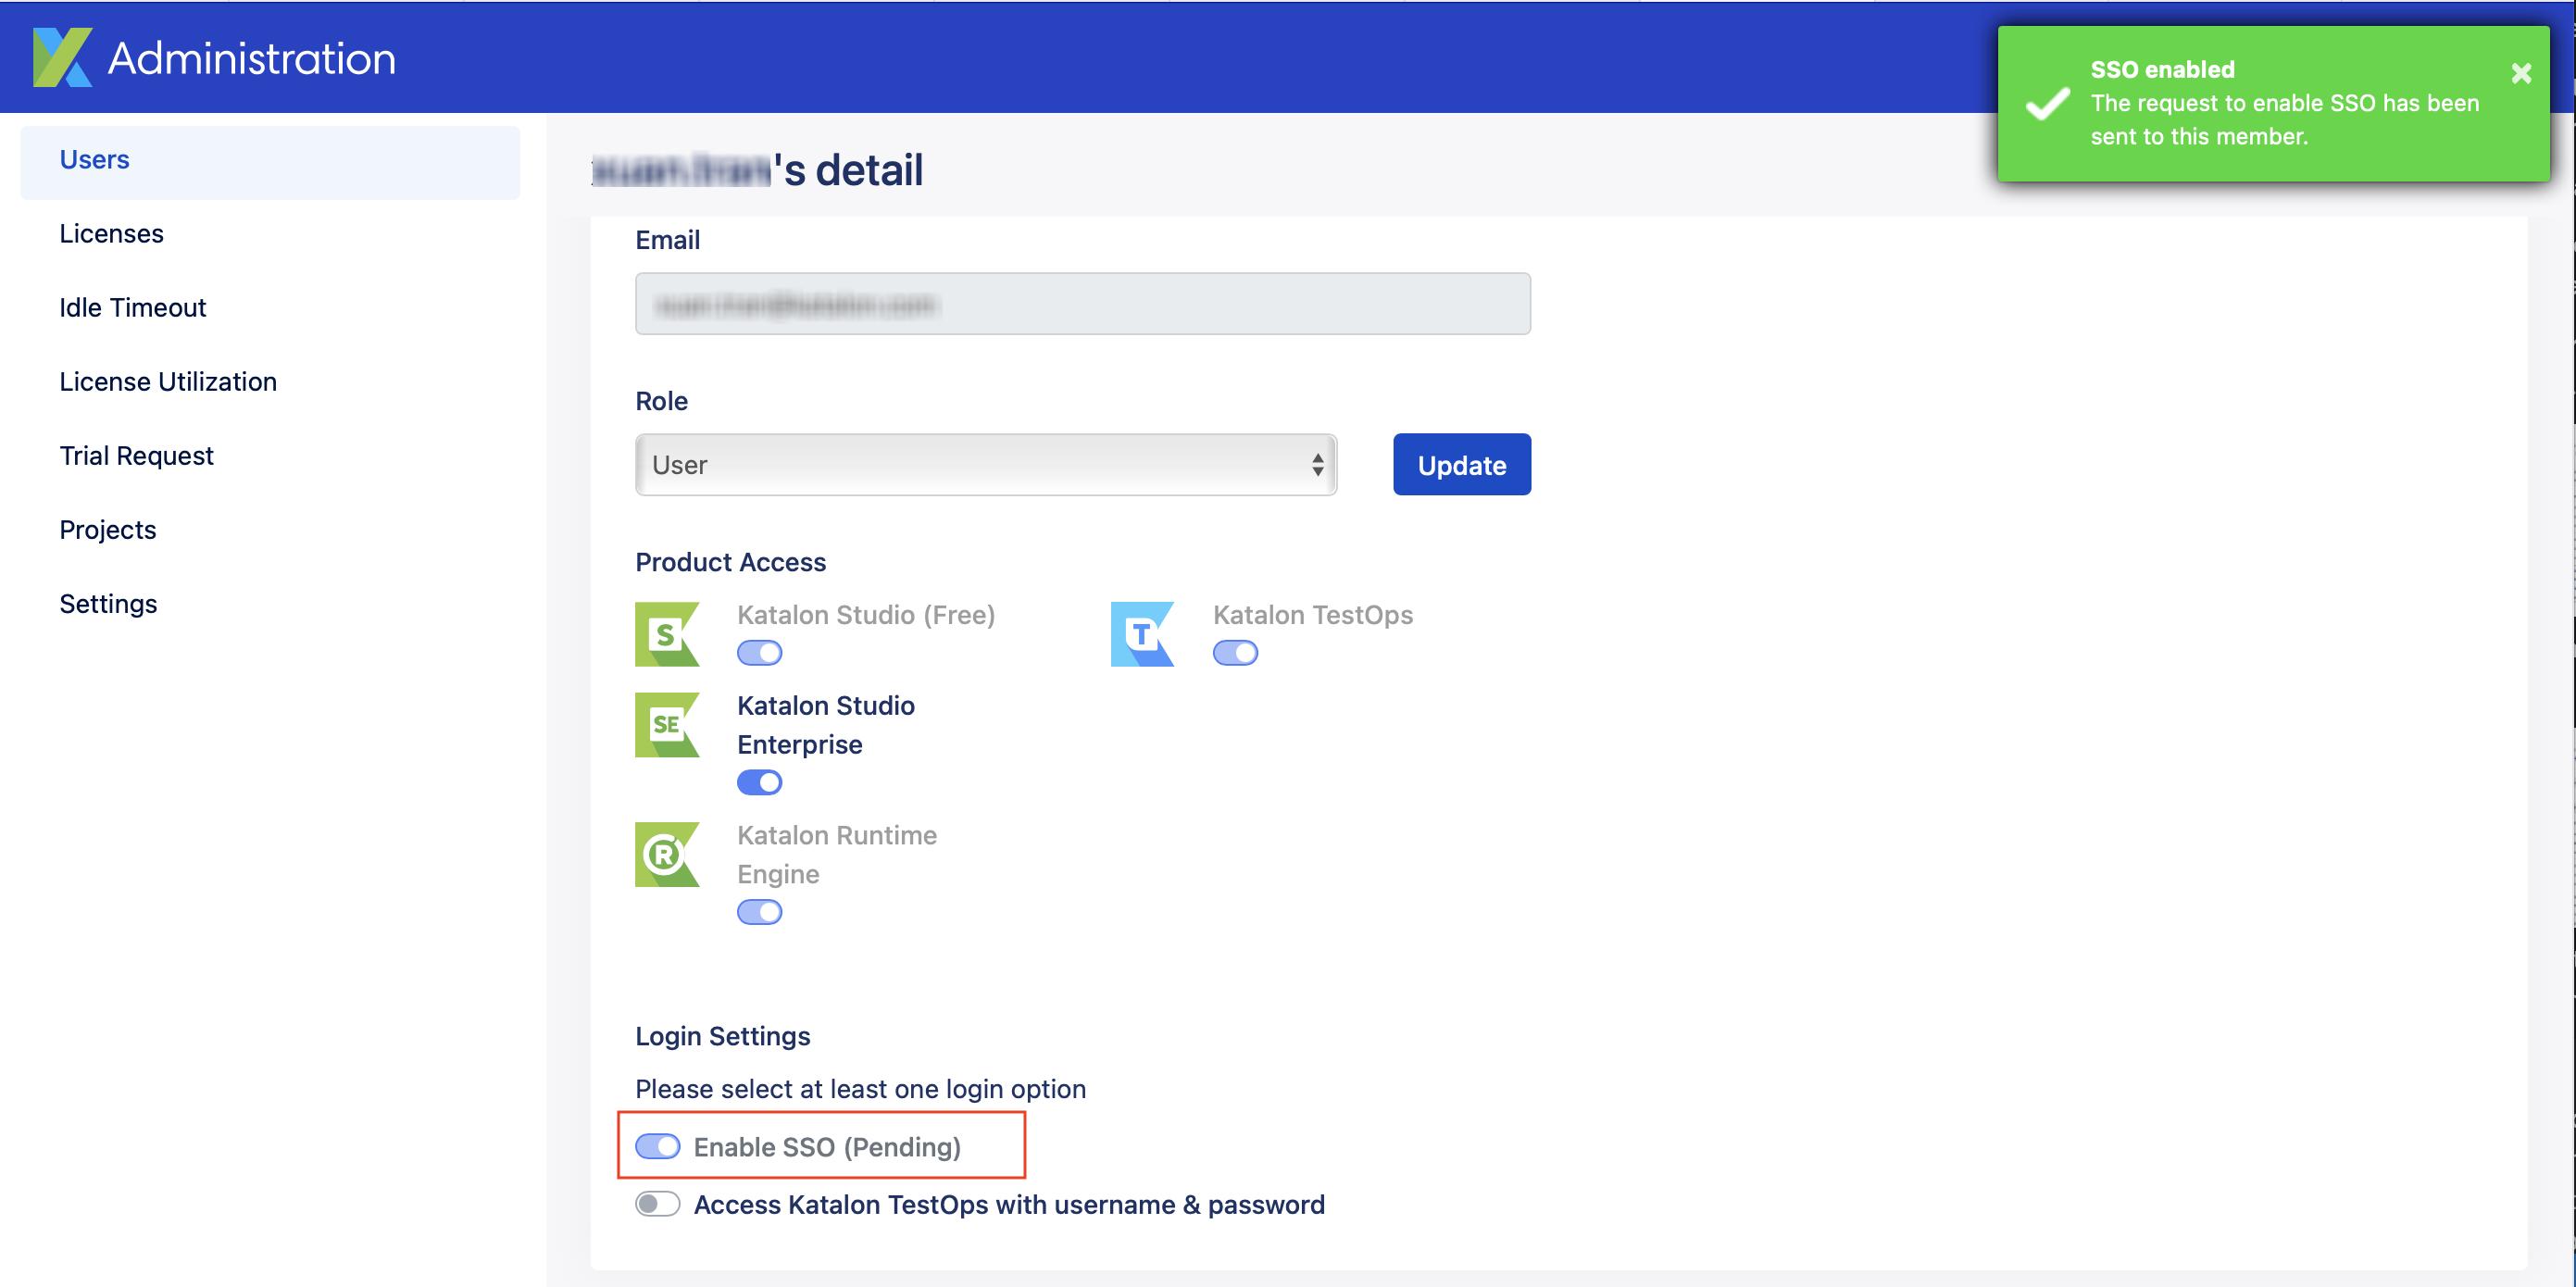 enable sso pending request sent box